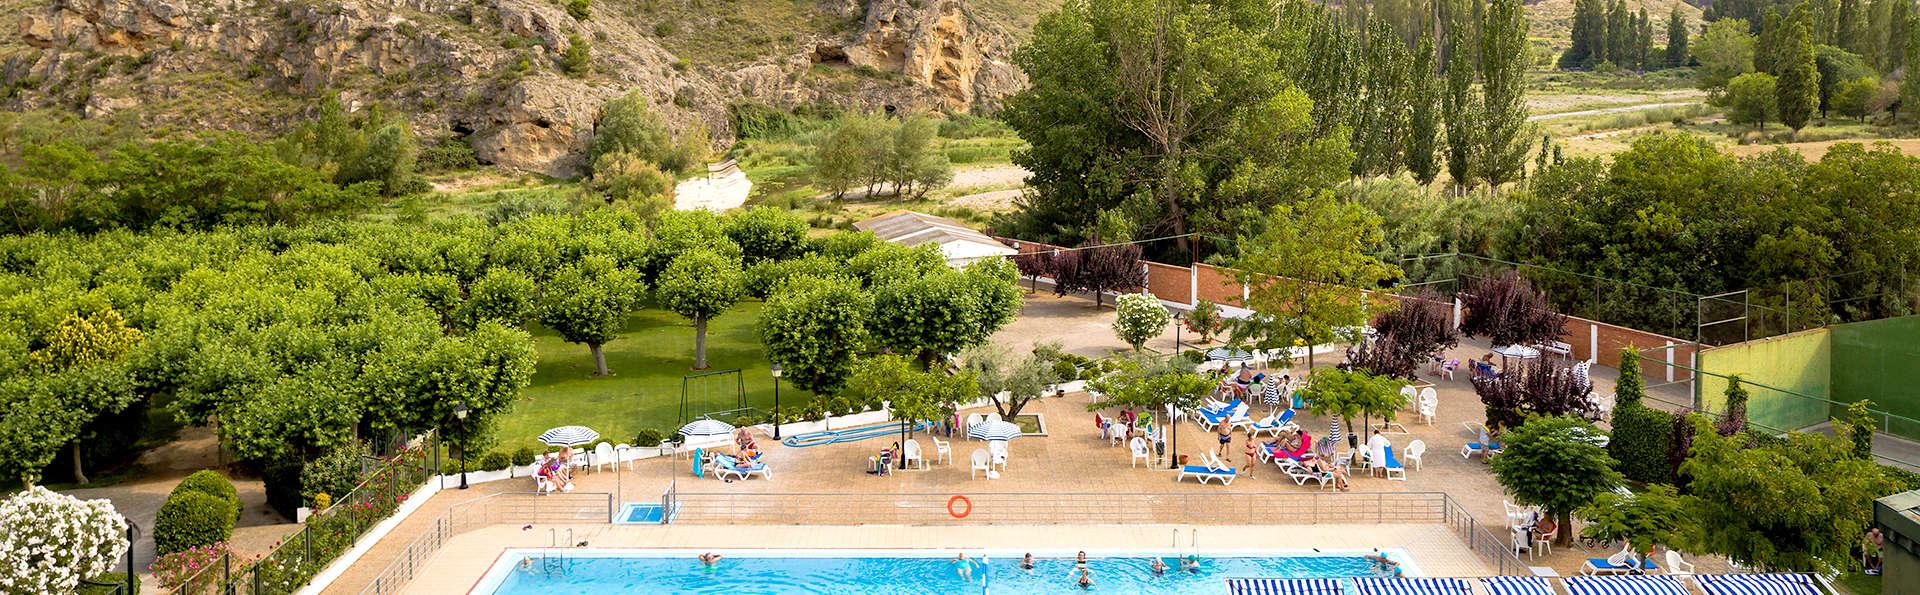 Balneario de Fitero - Hotel Bécquer - EDIT_NEW_POOL.jpg